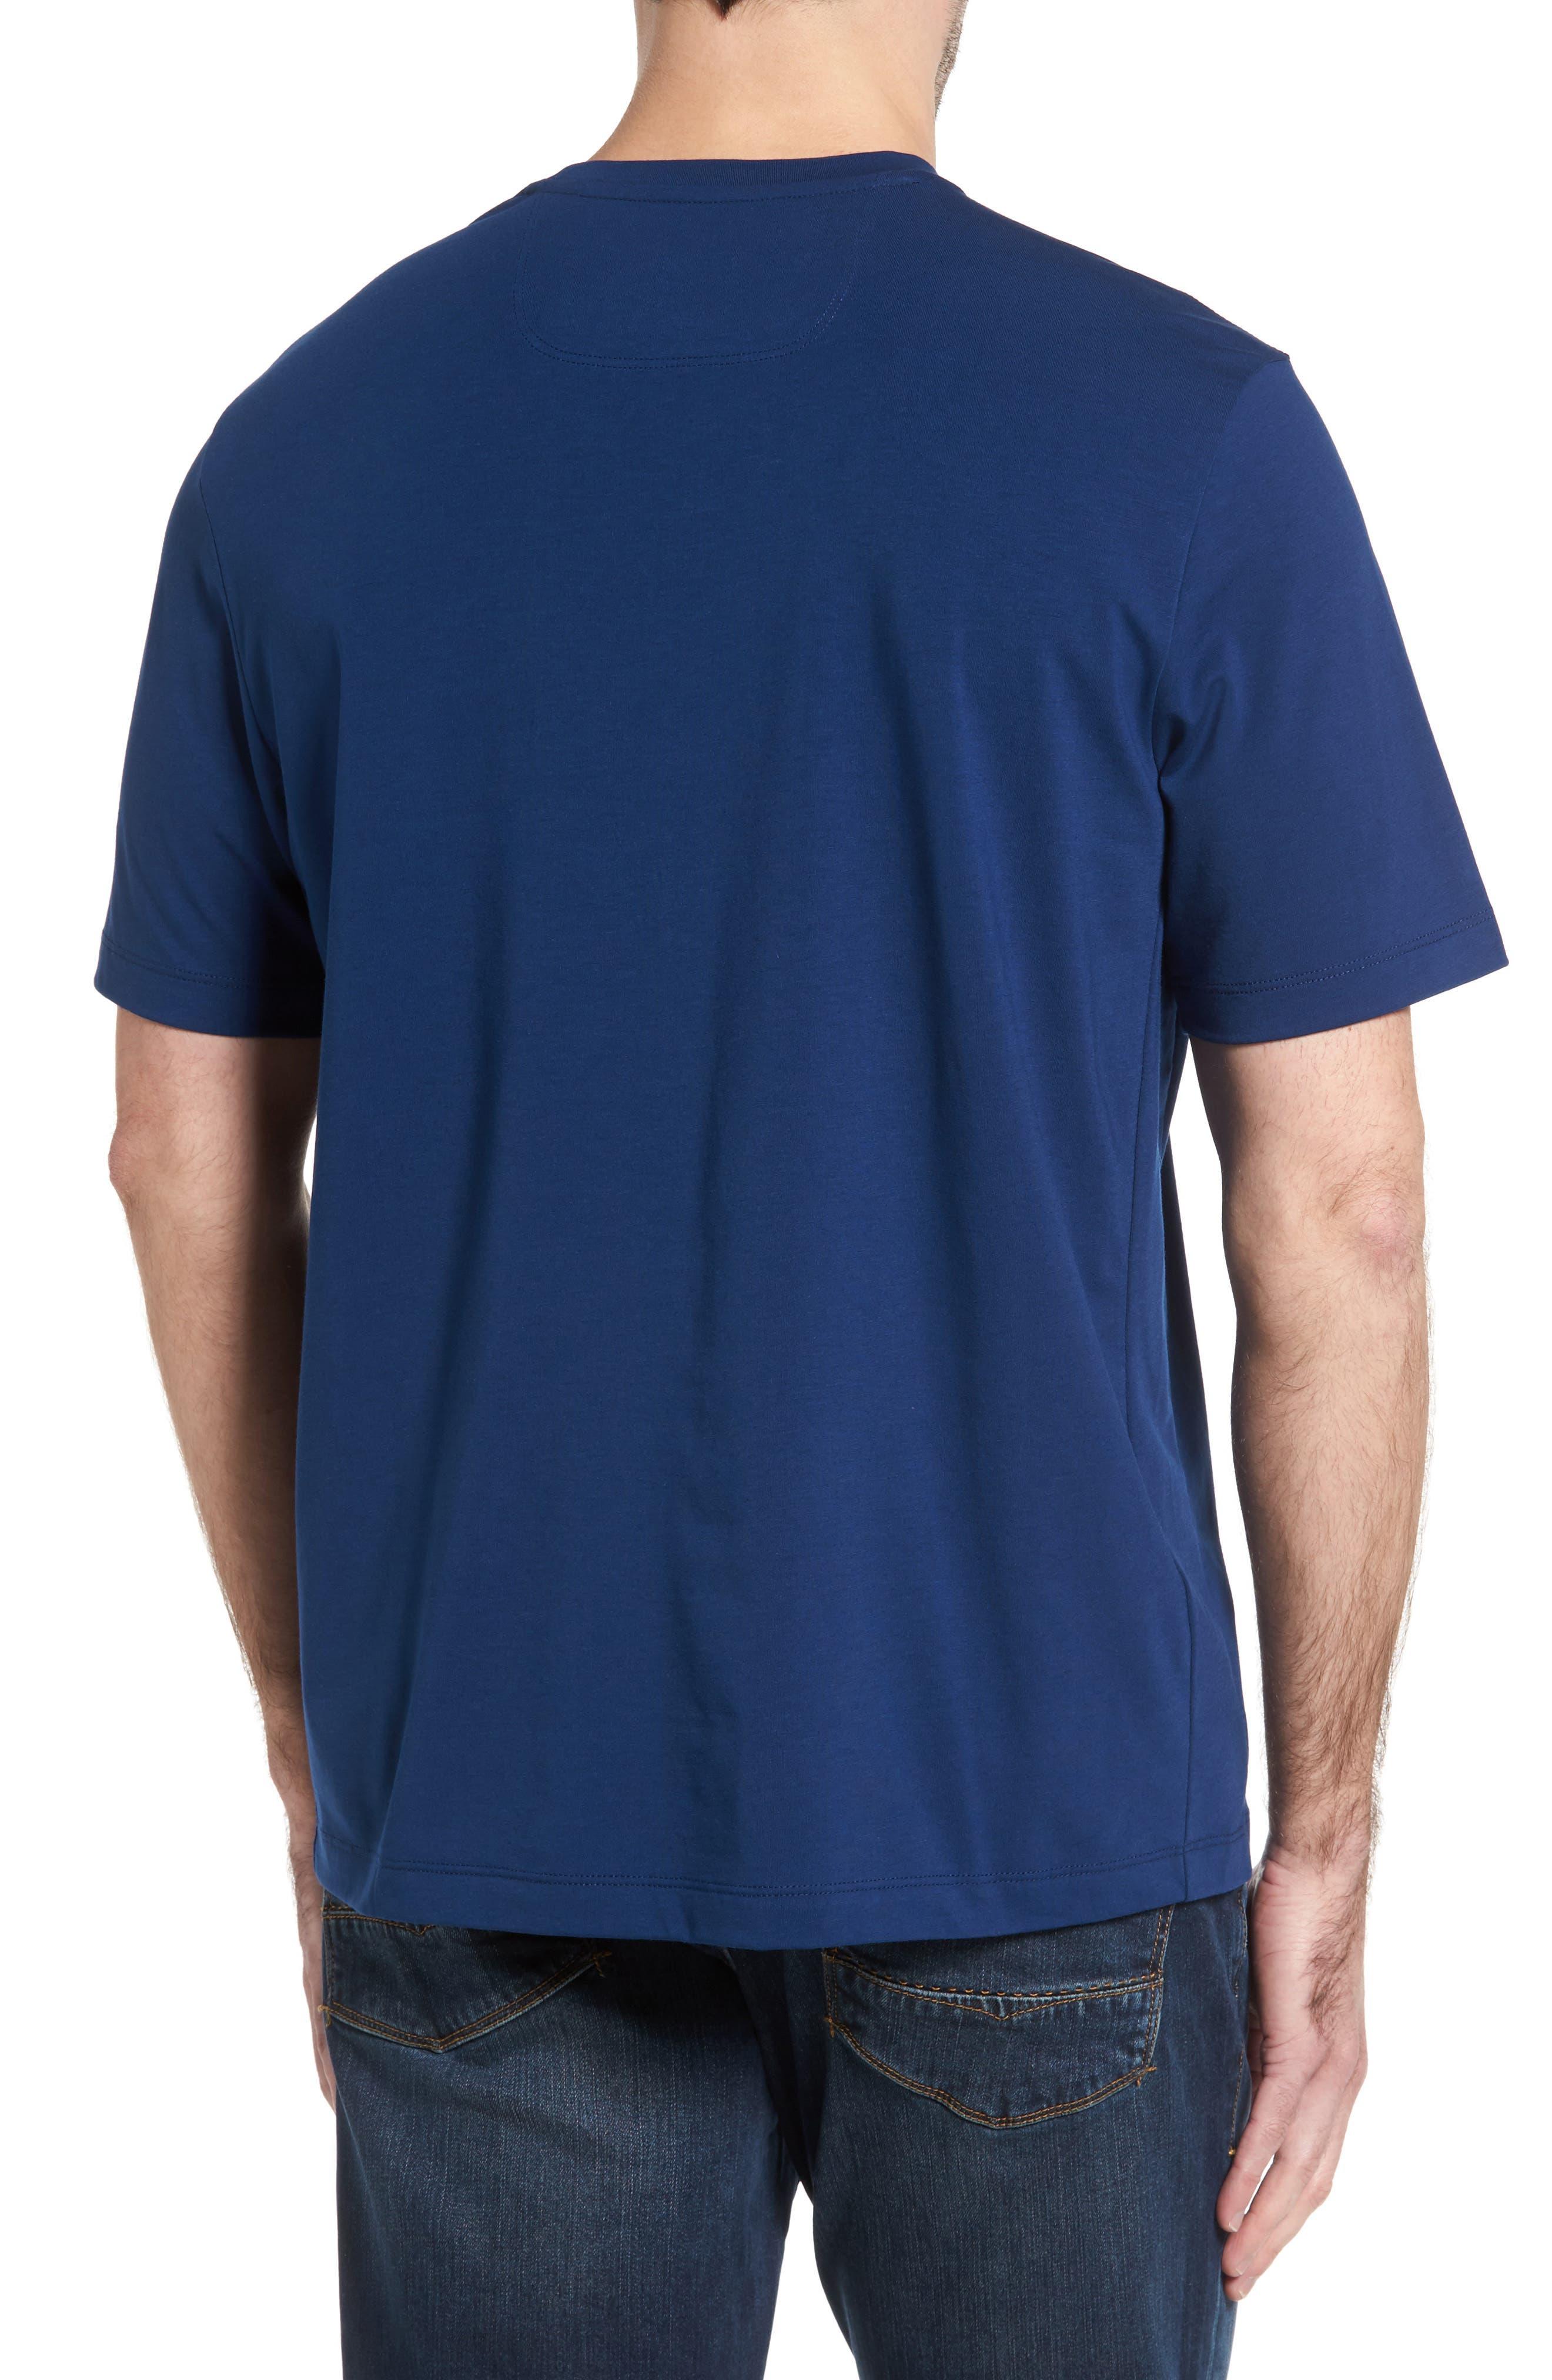 Tropicool T-Shirt,                             Alternate thumbnail 19, color,